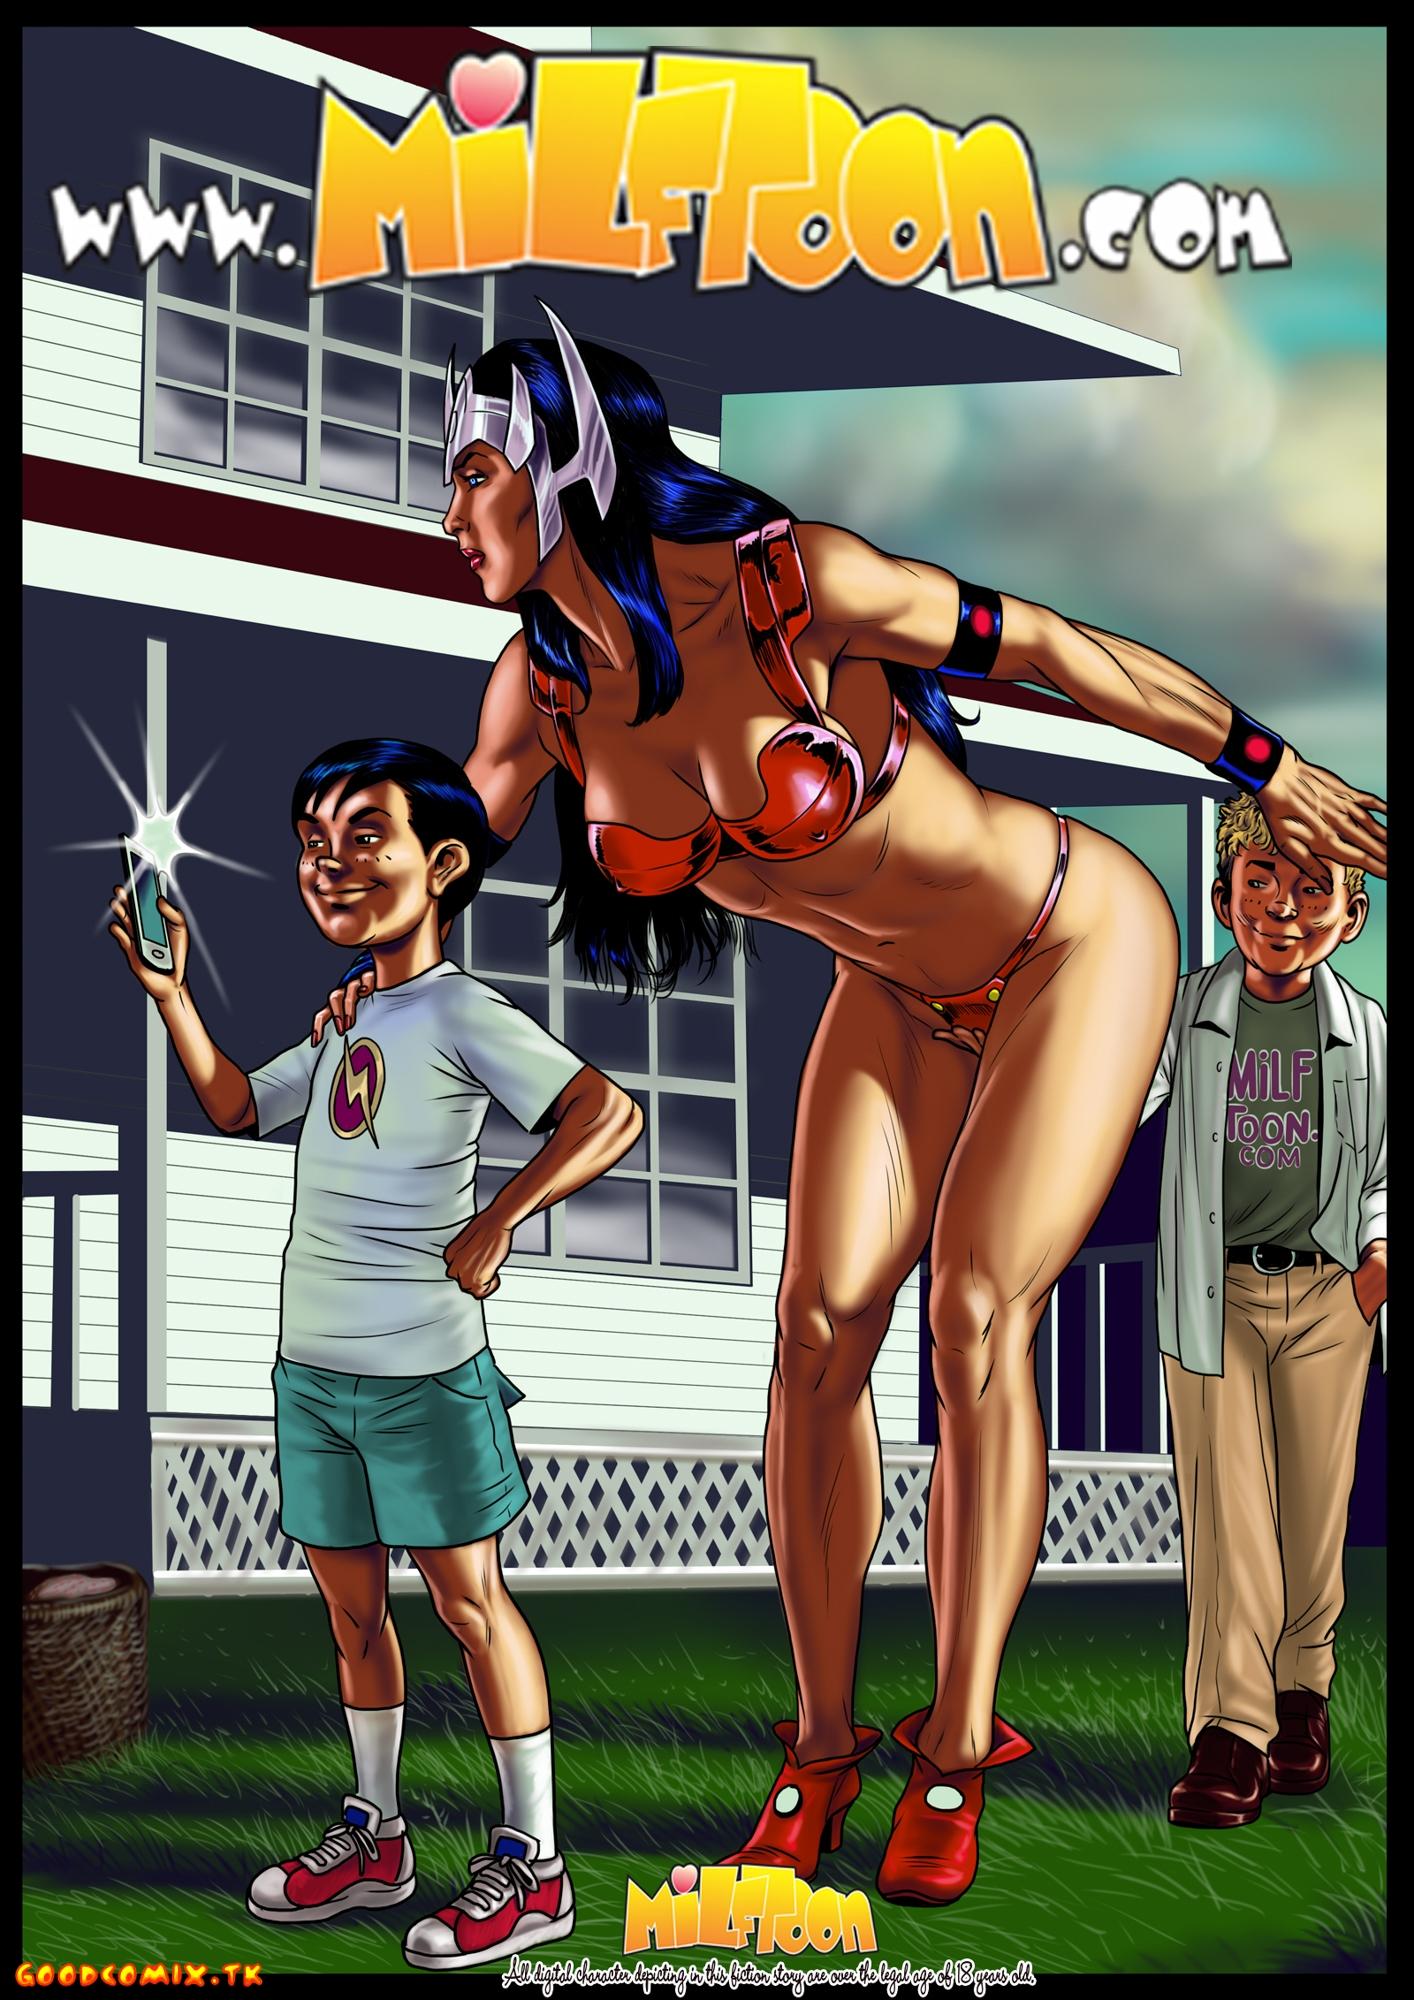 Goodcomix.tk DC Comics - [MilfToon] - Very, Very Hot Big Barda